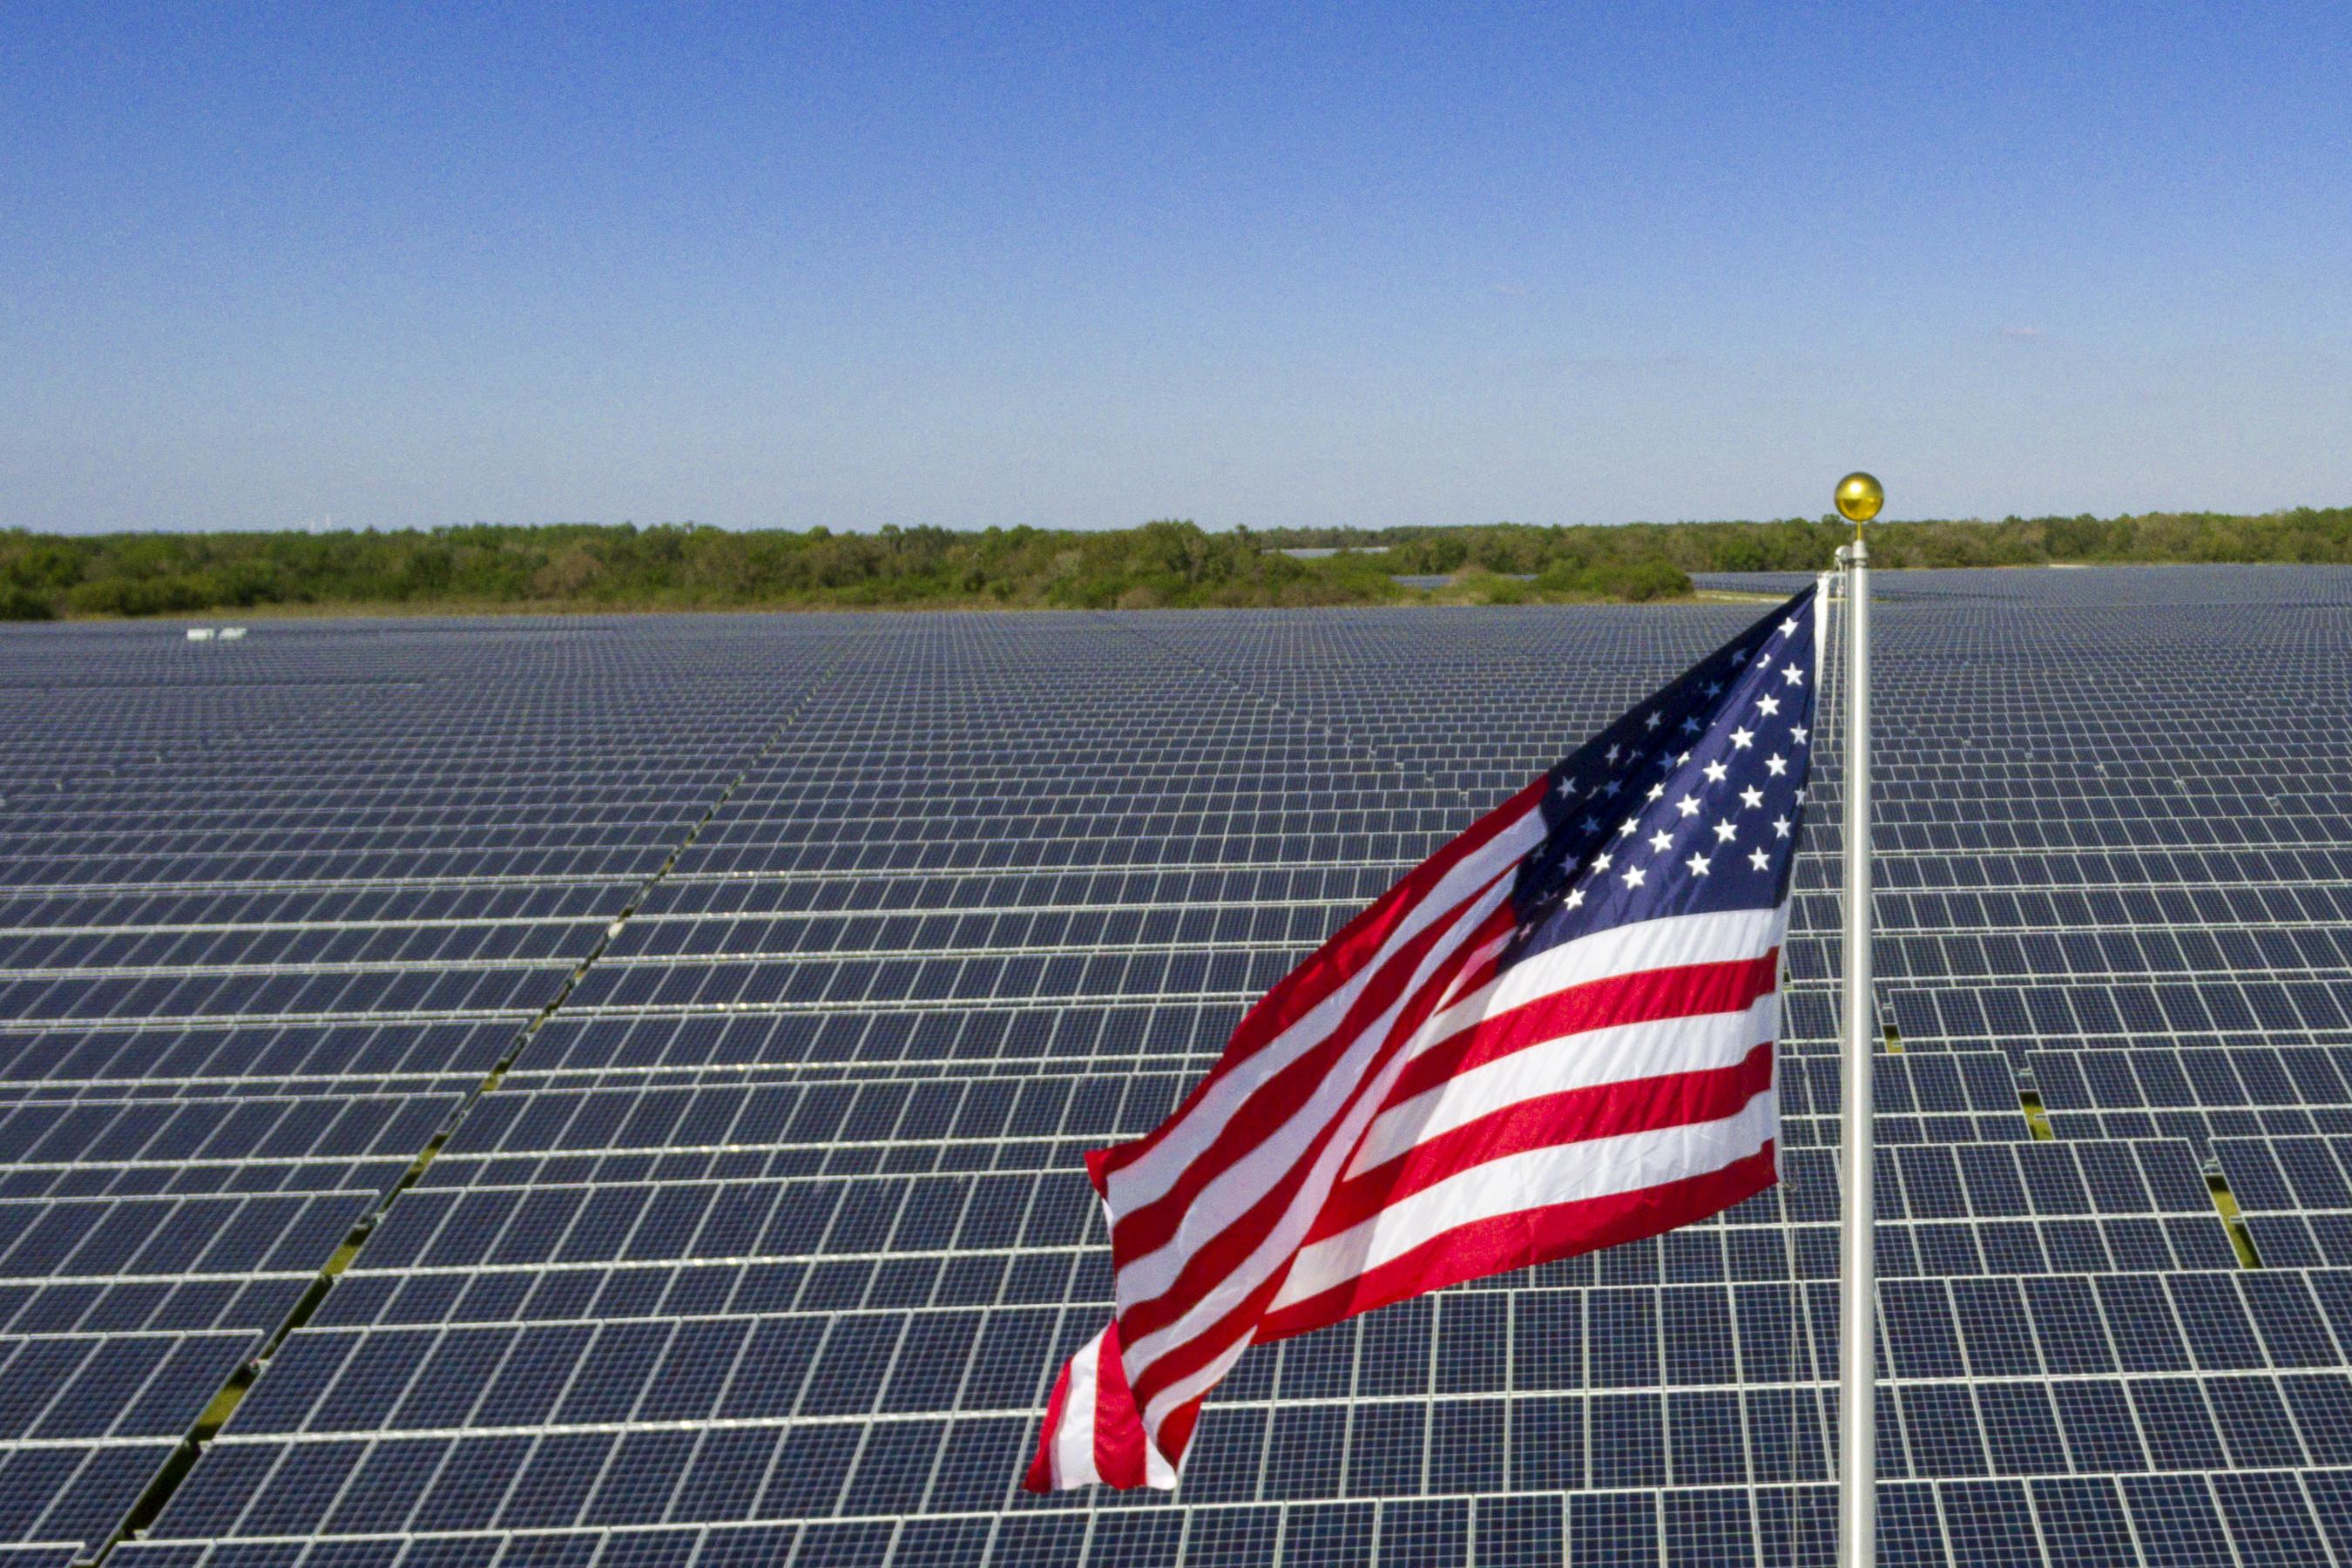 Eric Draper Florida Making Smart Progress On Solar